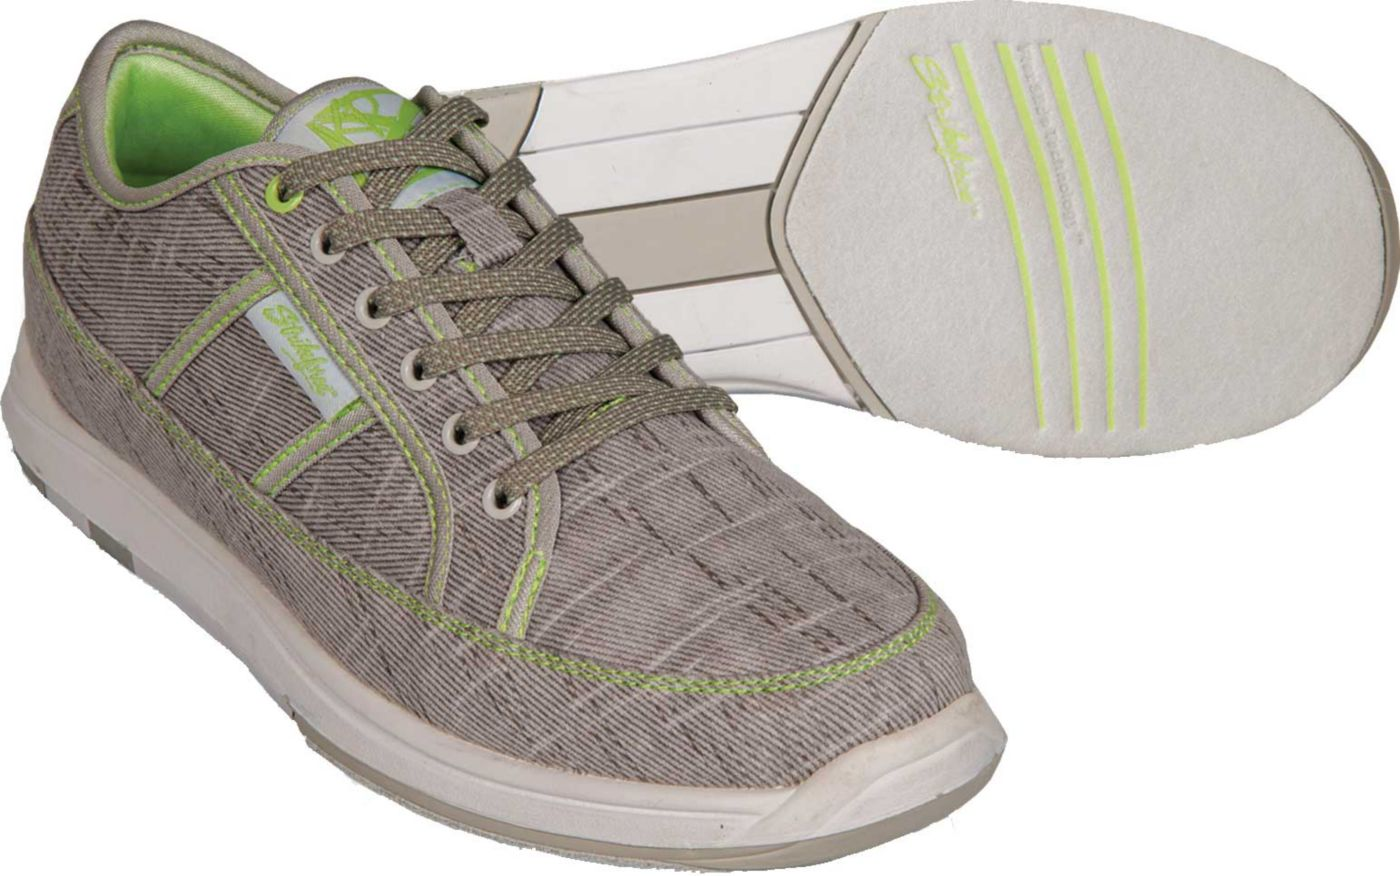 Strikeforce Women's Ivy Bowling Shoes